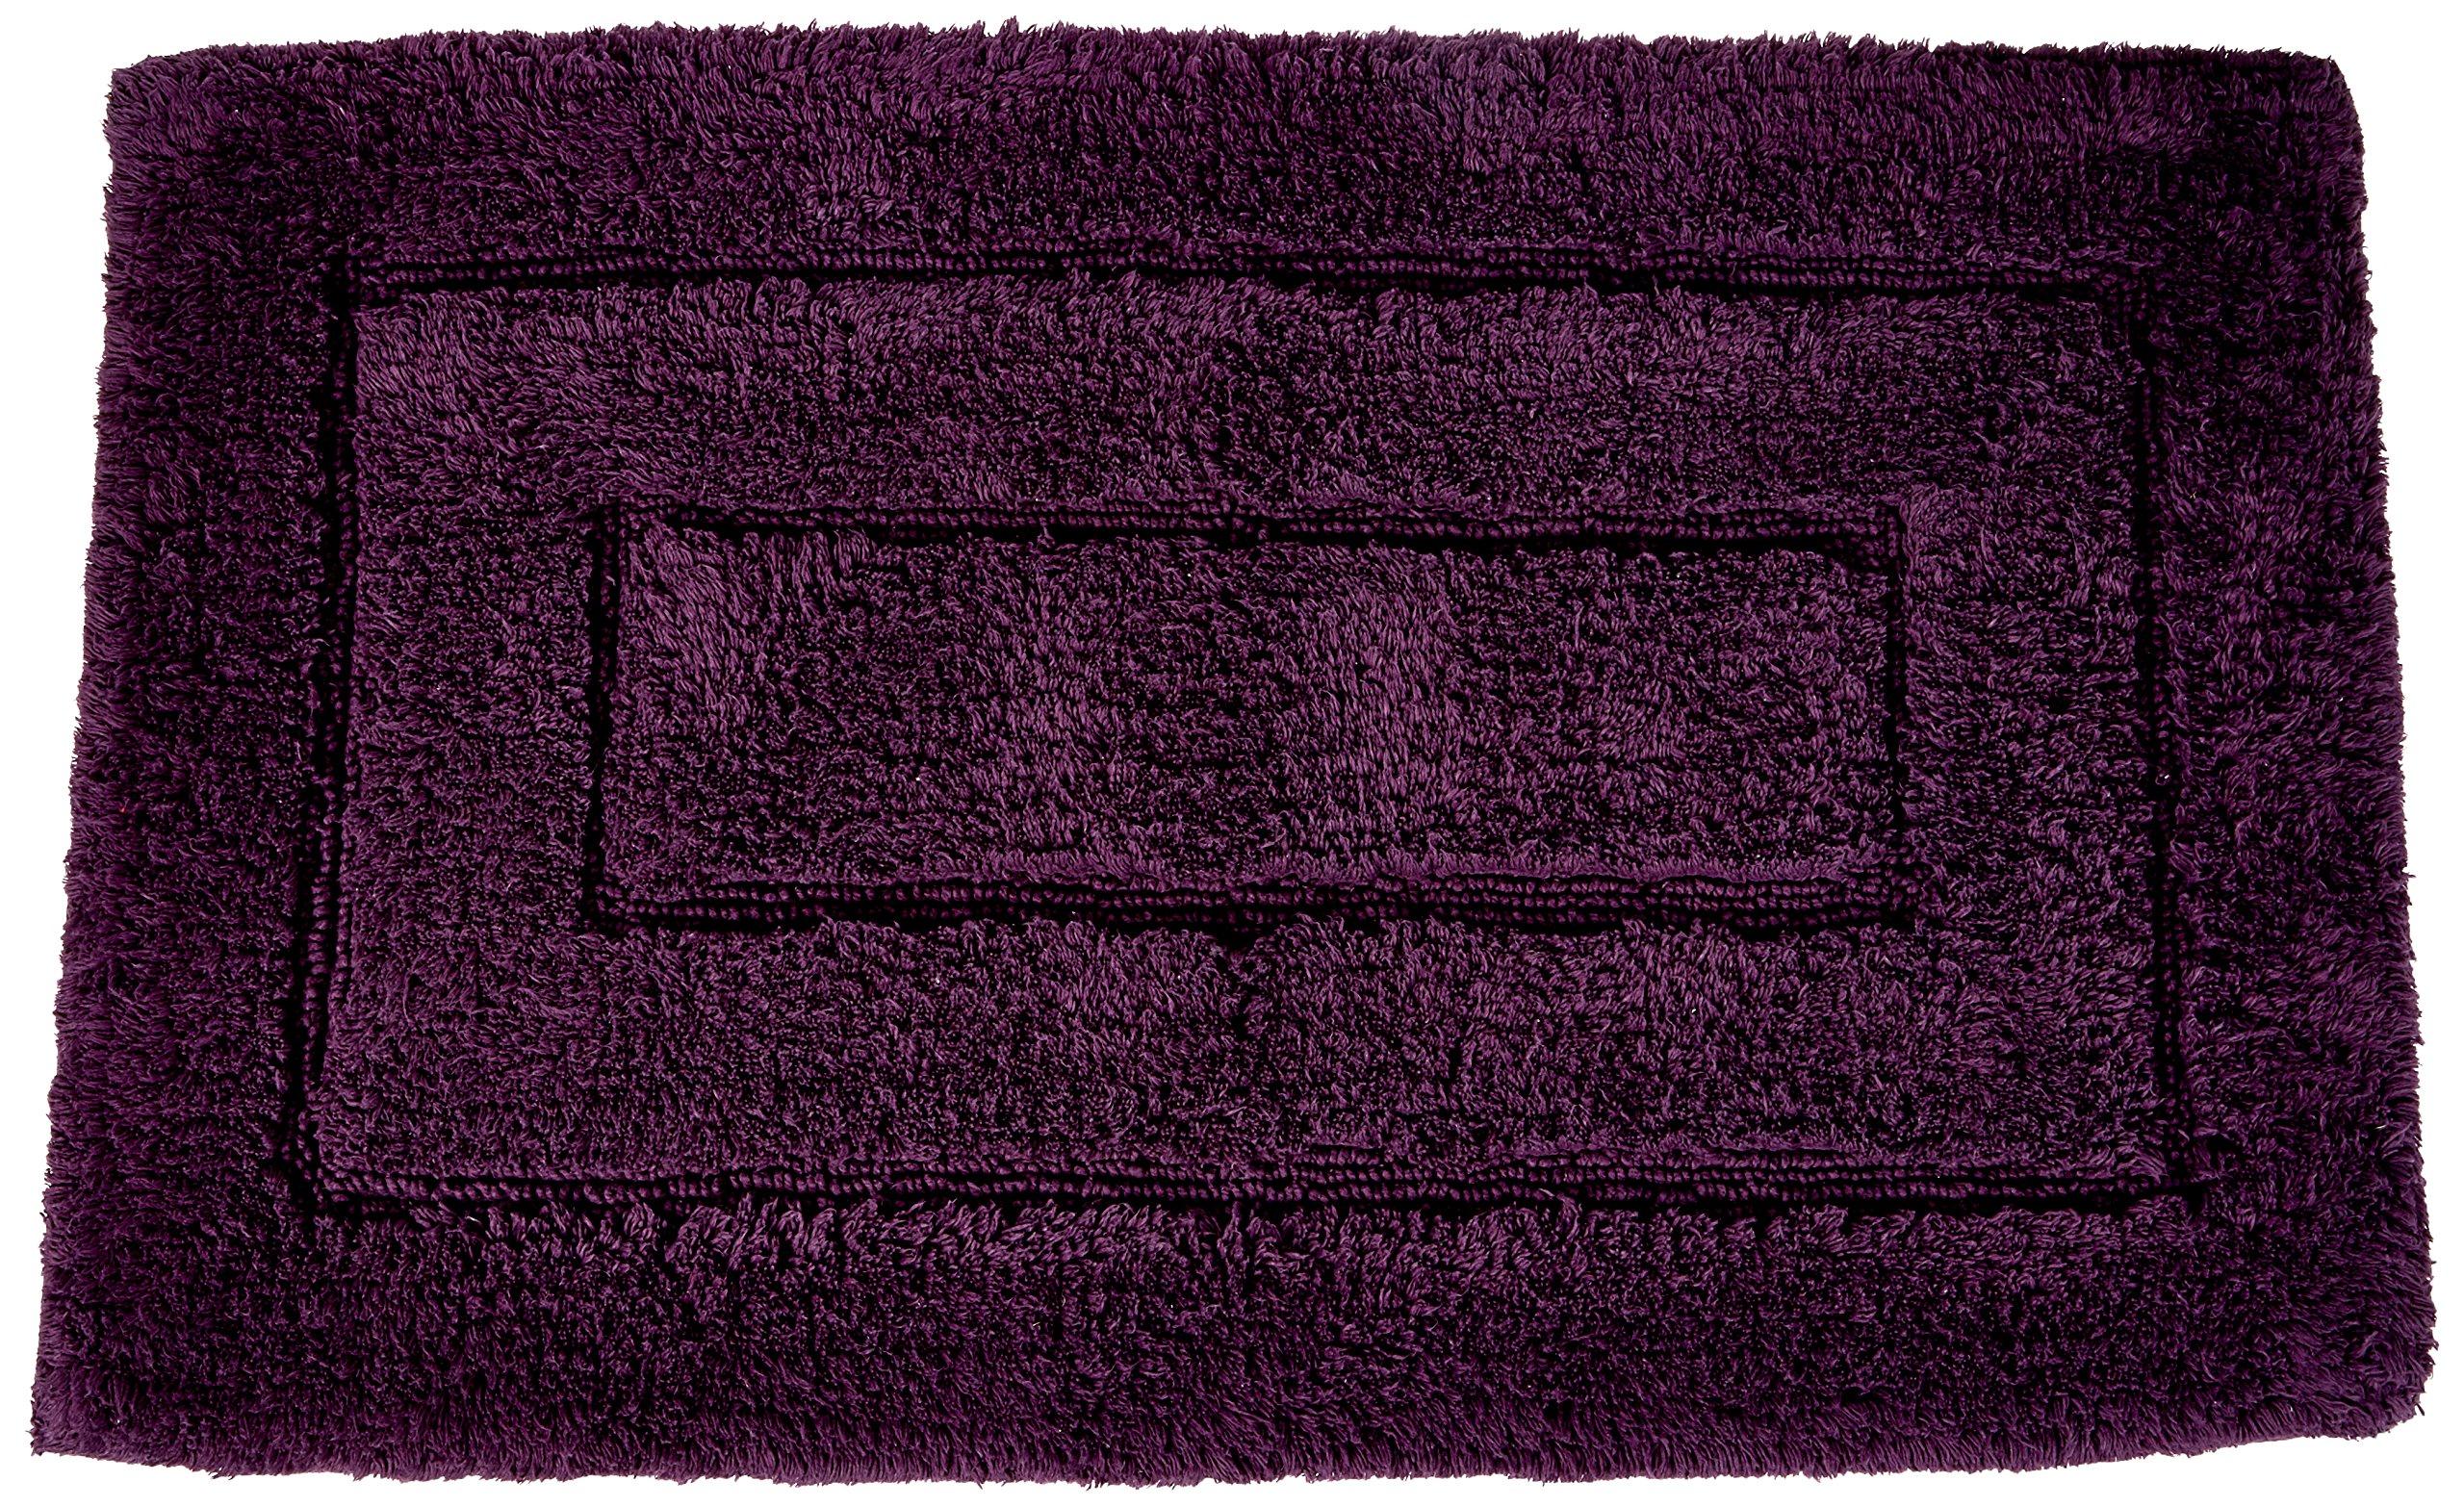 Kassatex 100-Percent Egyptian Cotton Kassa Design Bath Rug, 20 by 32-Inch, Plum